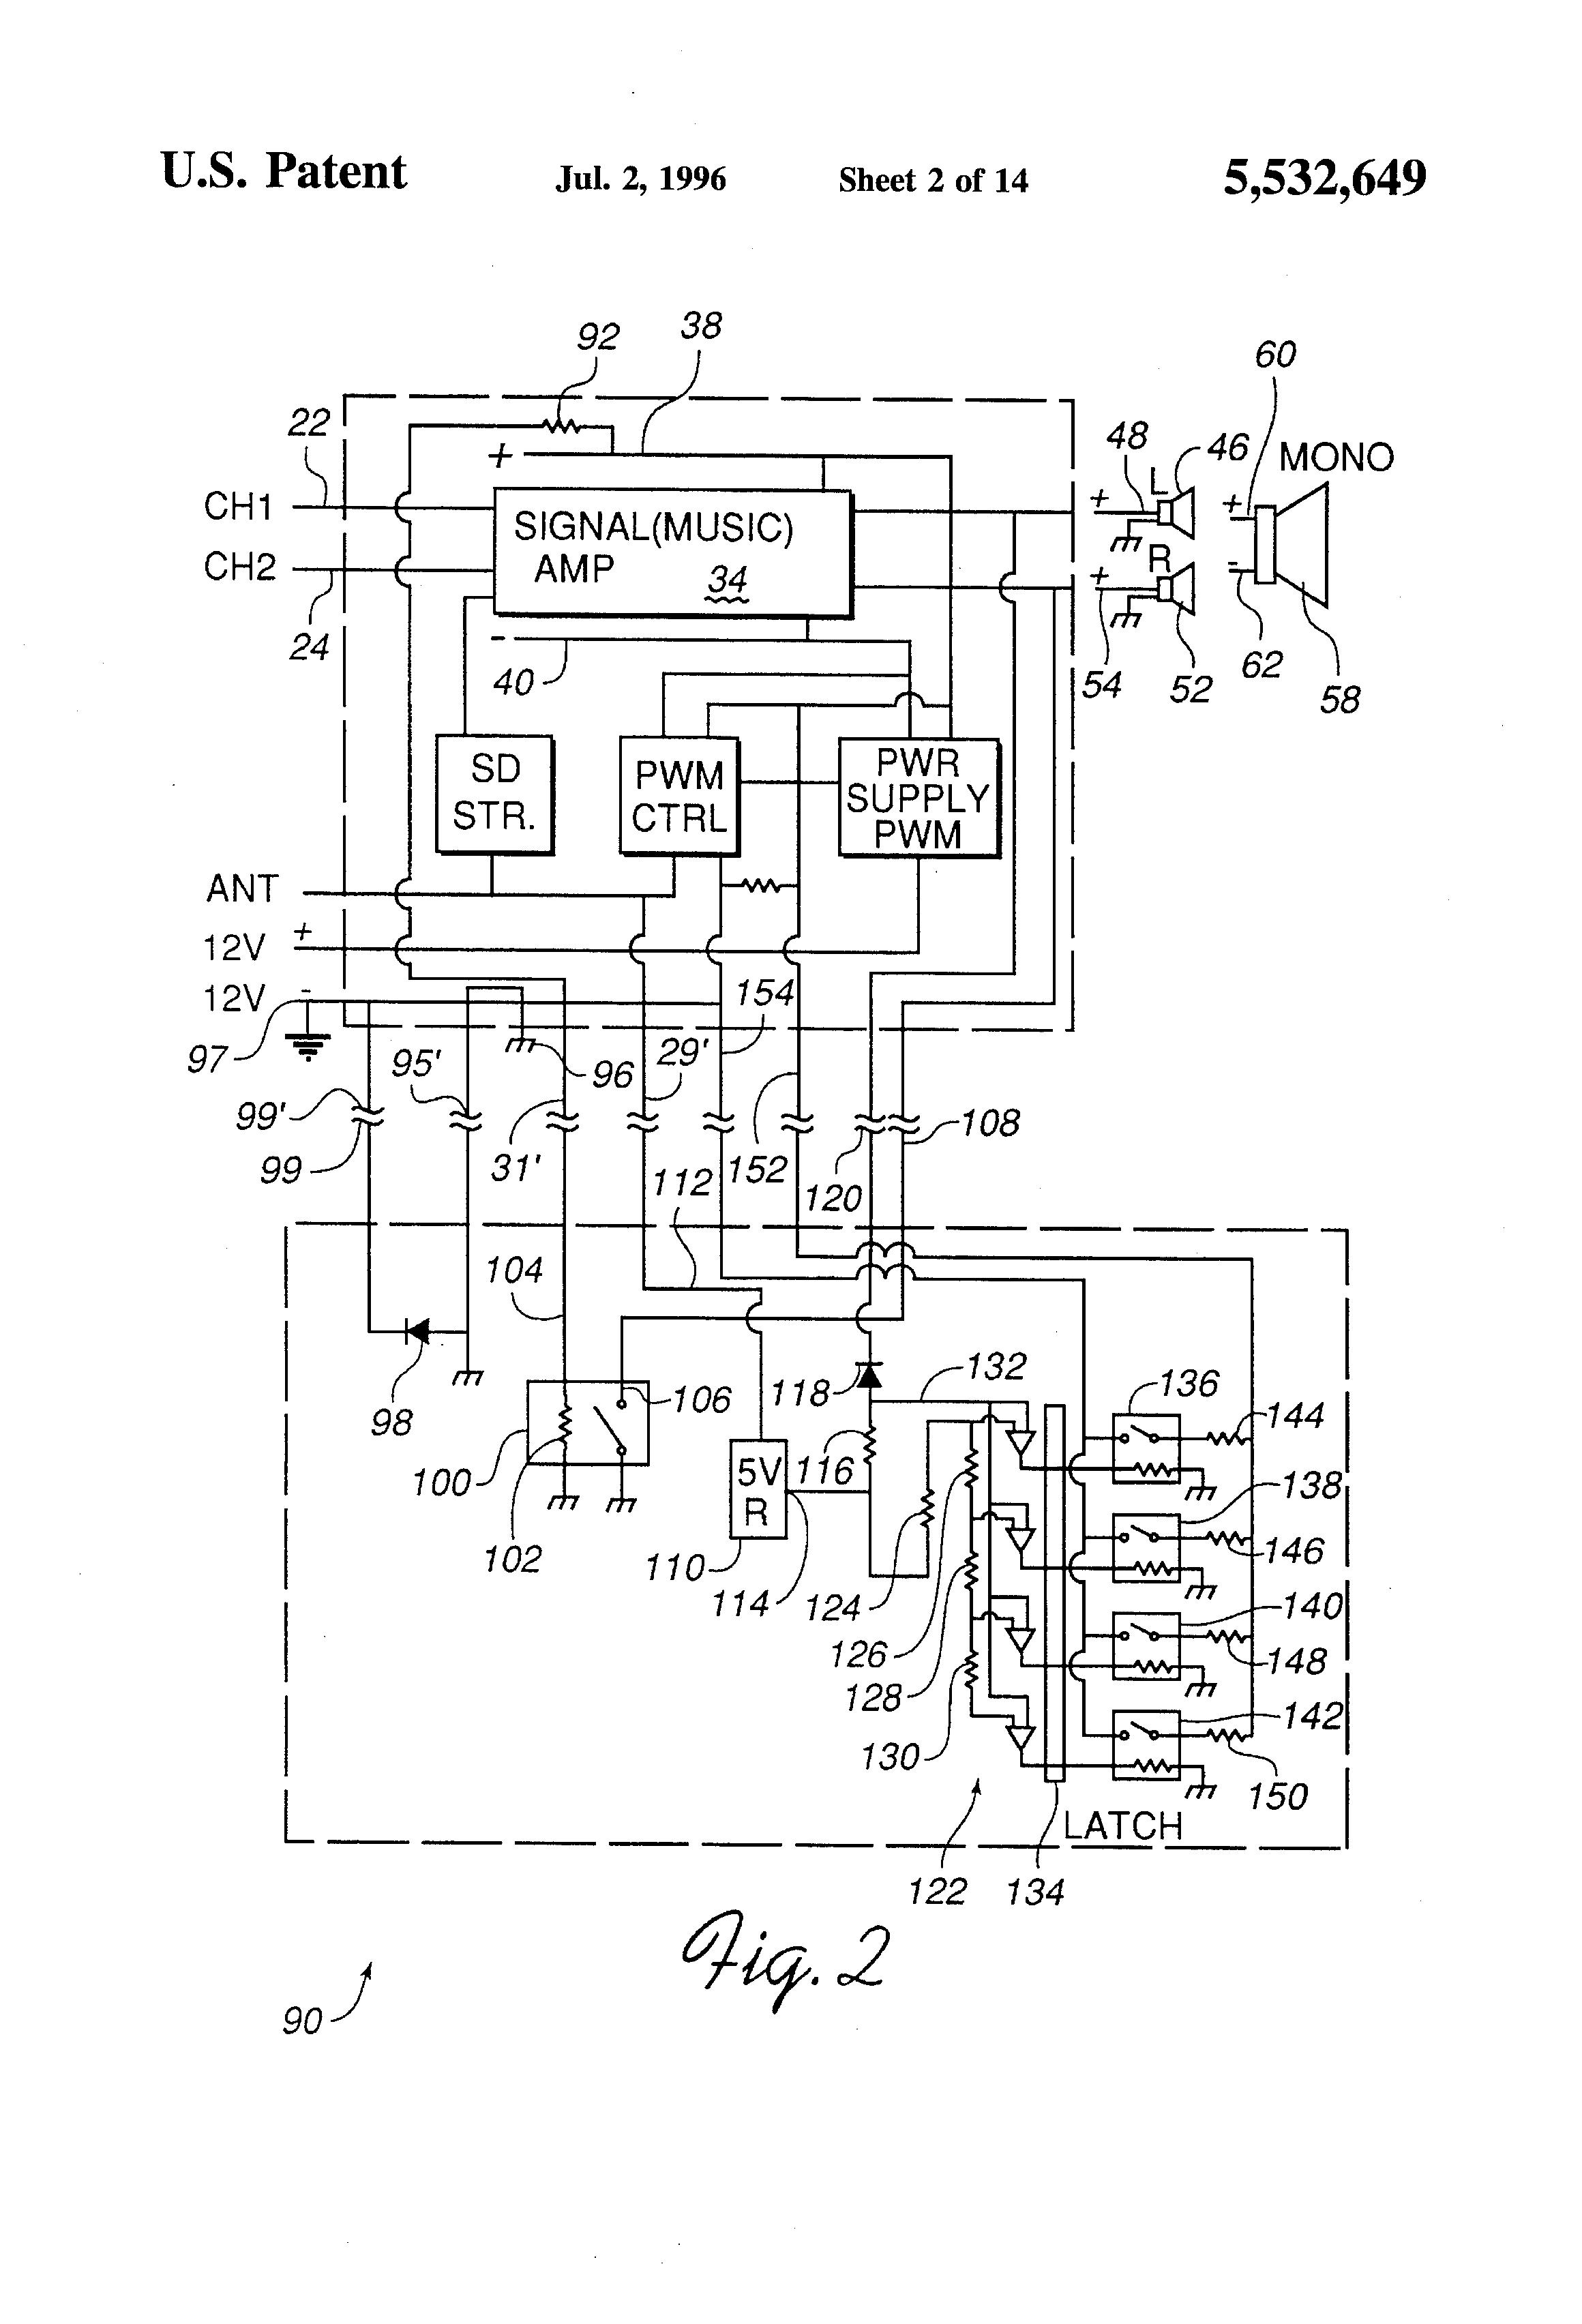 pms wiring diagram 9 tramitesyconsultas co u2022 rh 9 tramitesyconsultas co Mercedes Wiring Diagram Color Codes Mercedes Ignition Diagram